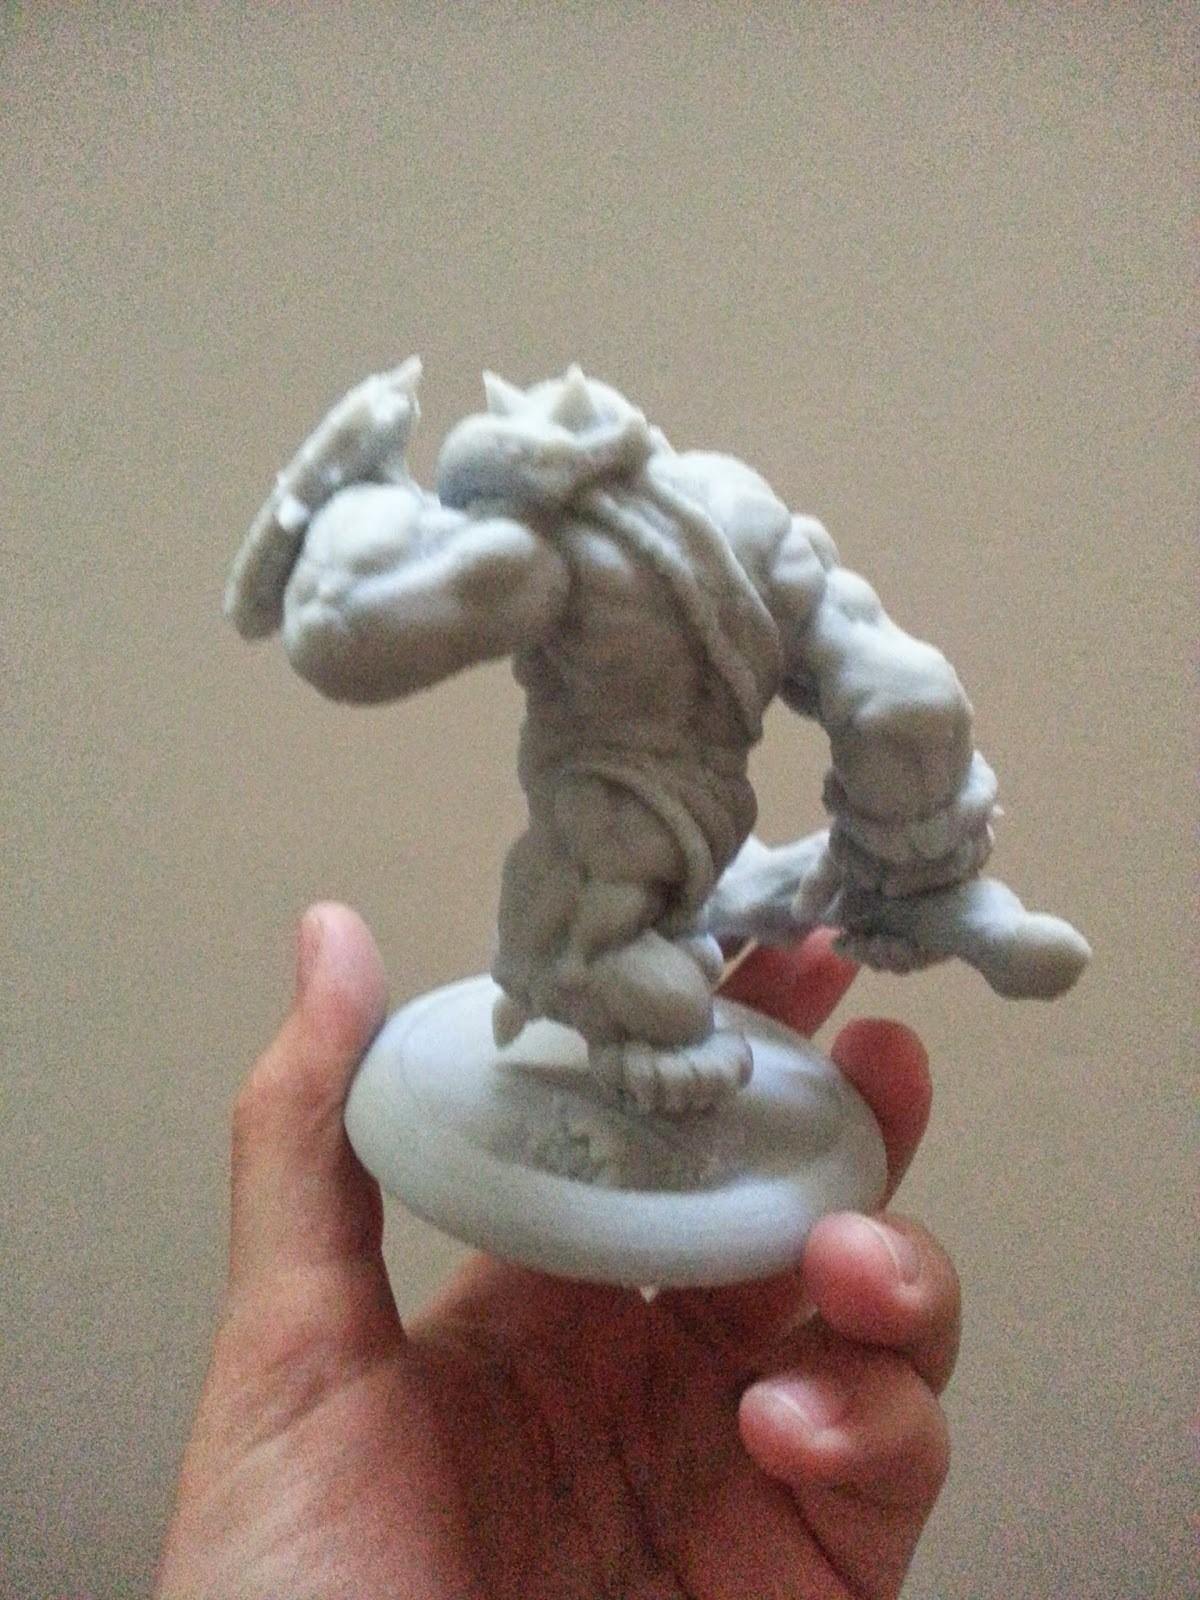 4.jpg Download STL file Grunt War Club, 3D printed Orc • Design to 3D print, kfir